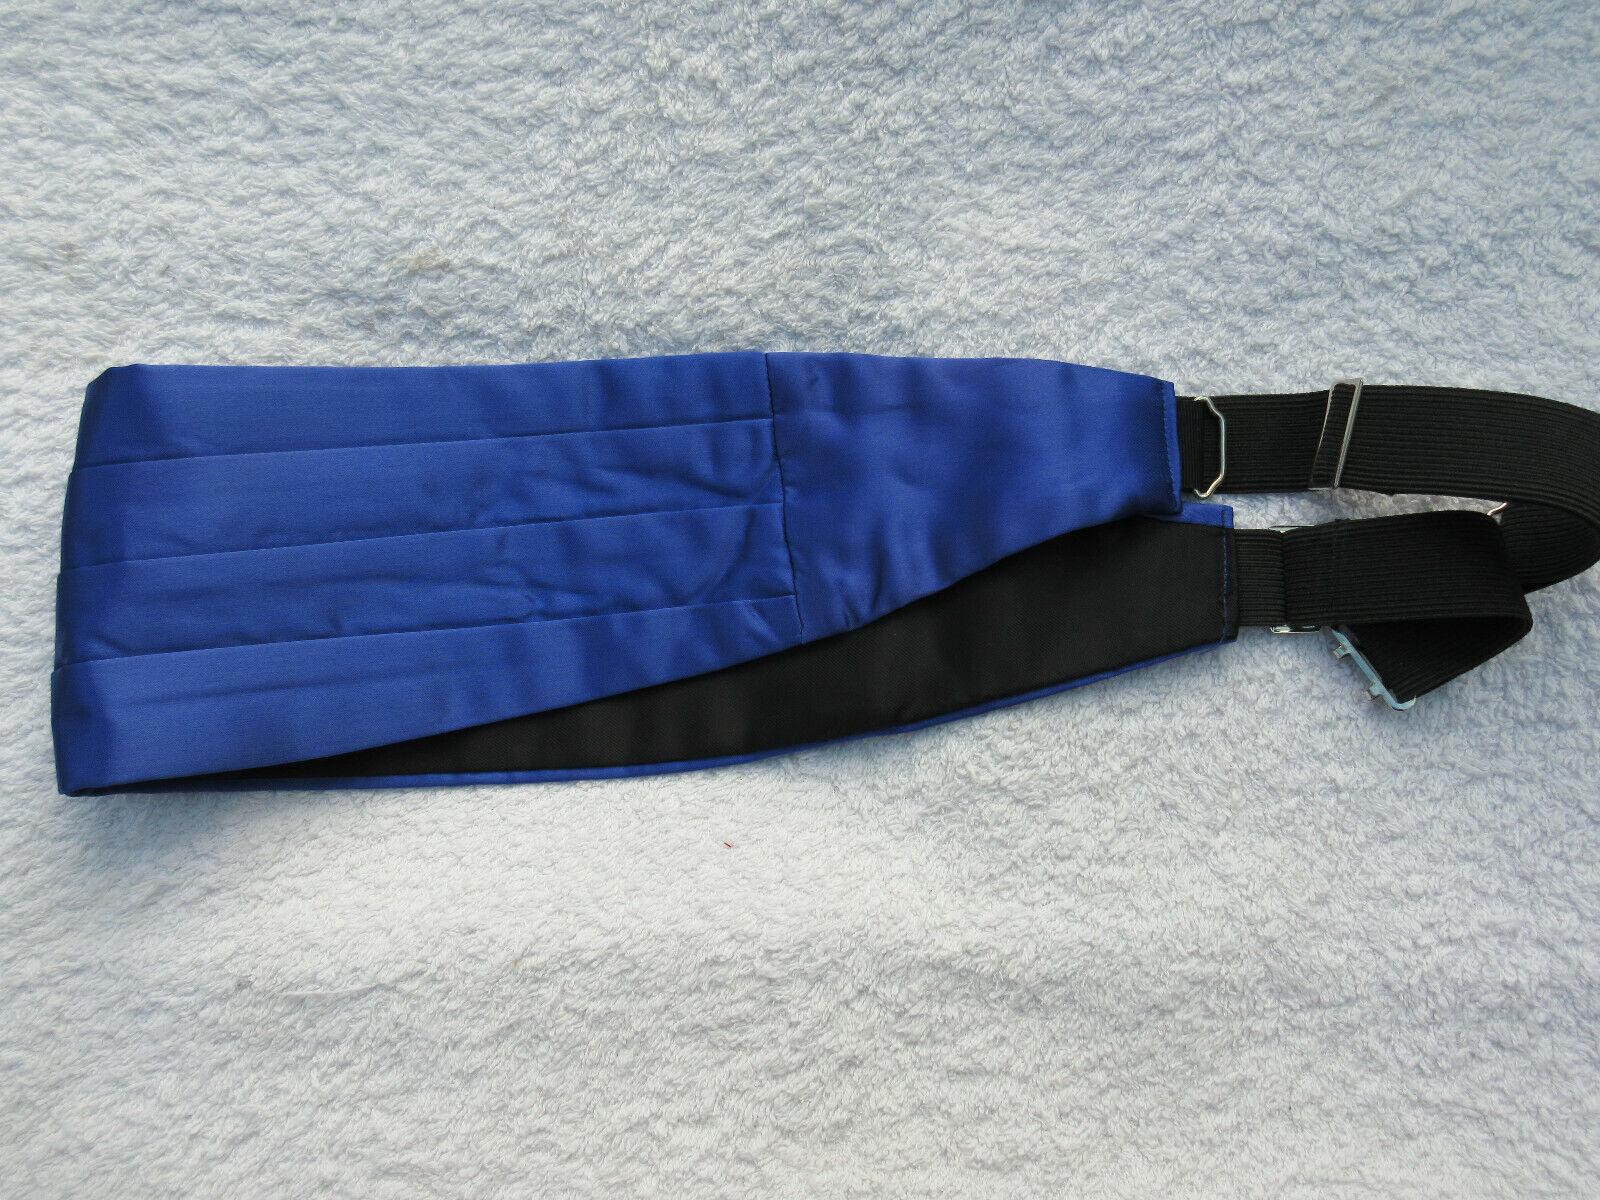 CUMMERBUND Adjustable SHINEY BLUE 4 PLEAT Iin ACETATE from FREDRICK & THEAK